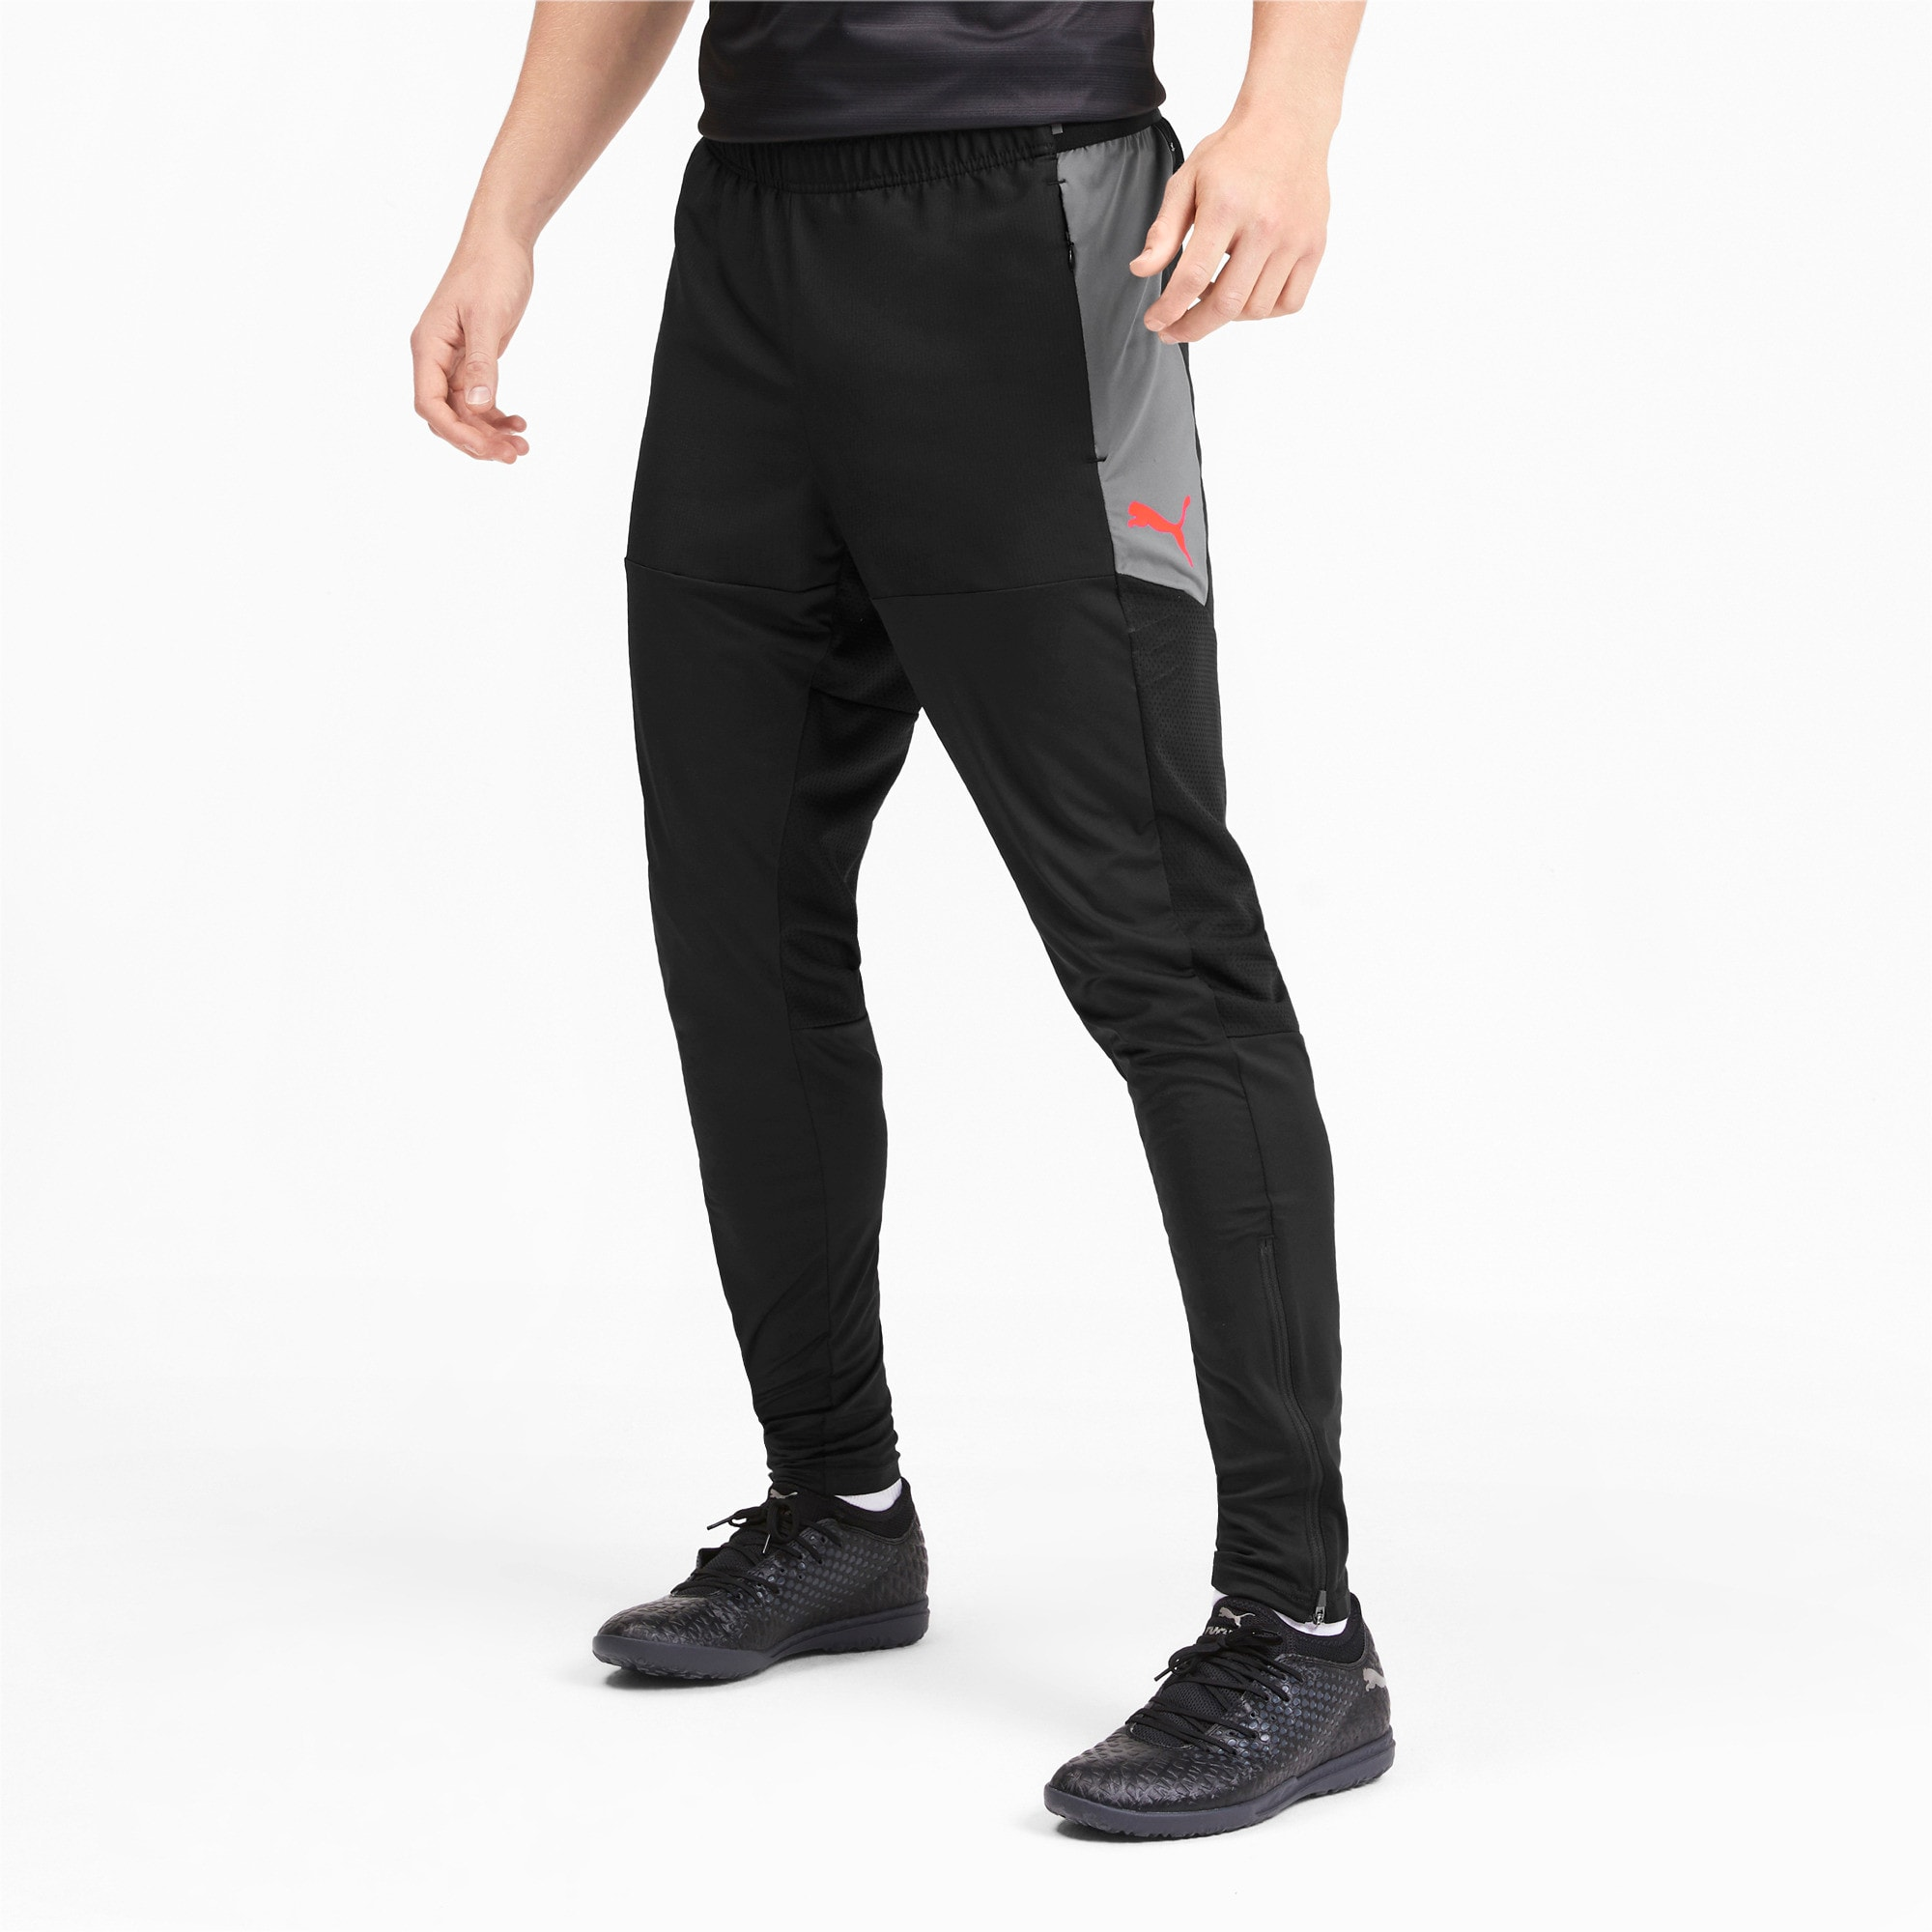 Thumbnail 1 of ftblNXT Men's Pro Pants, Puma Black-Nrgy Red, medium